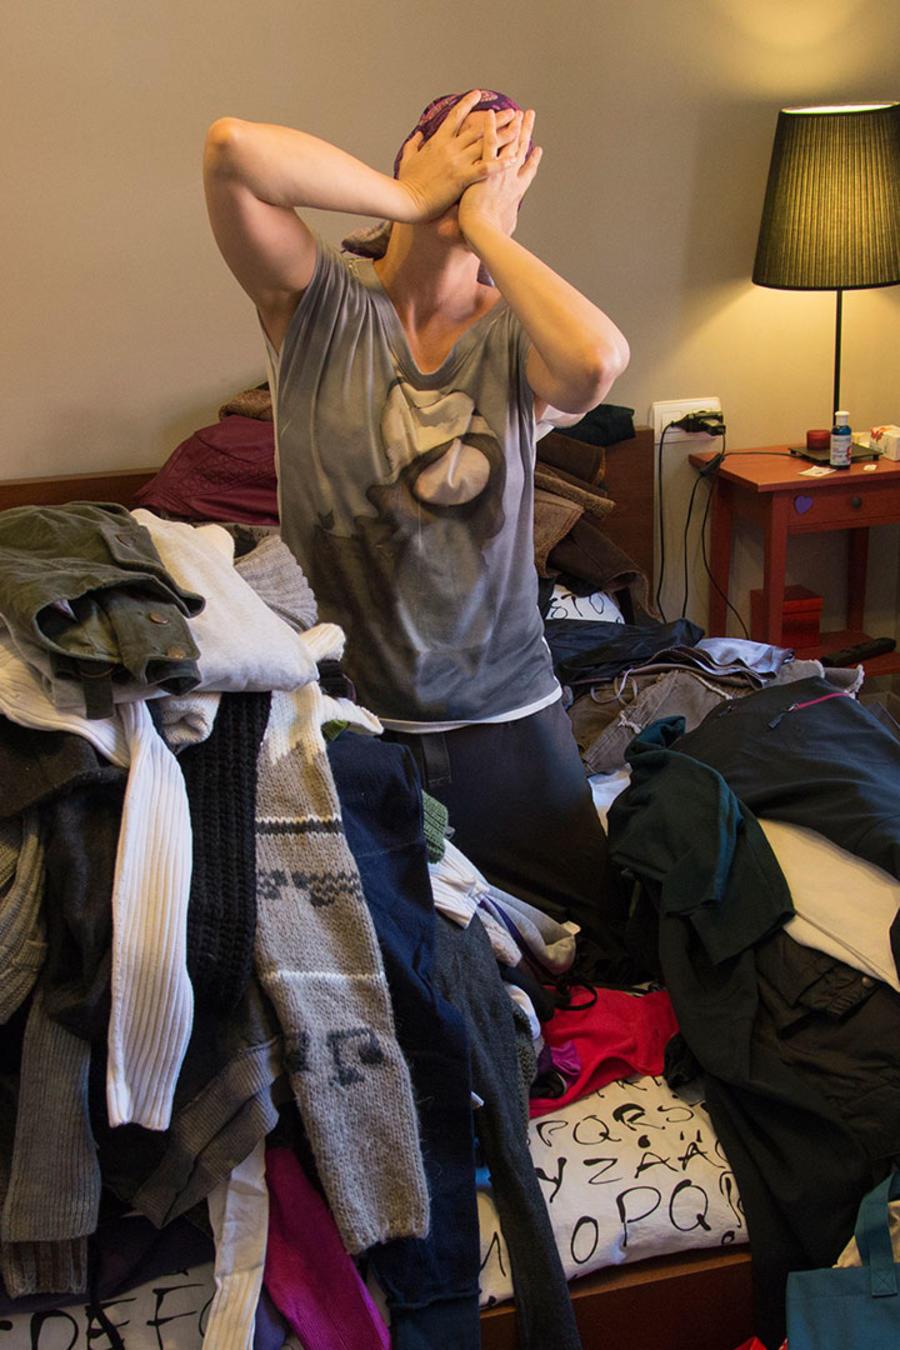 Mujer con mucha ropa